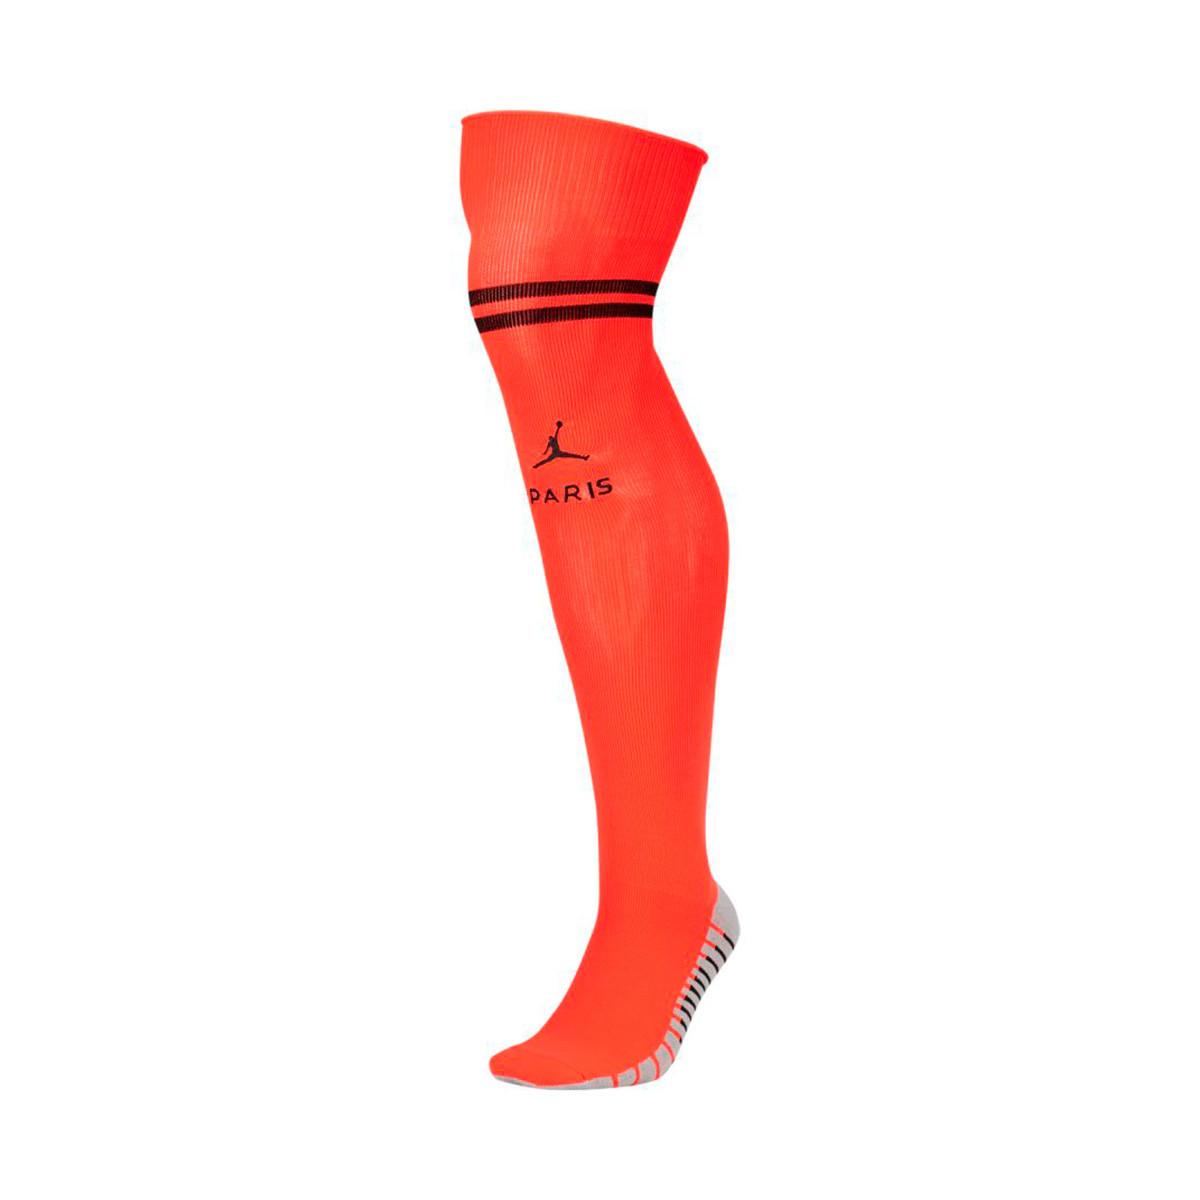 Football Socks Nike Paris Saint Germain Stadium Otc Segunda Equipacion 2019 2020 Infrared Black Football Store Futbol Emotion